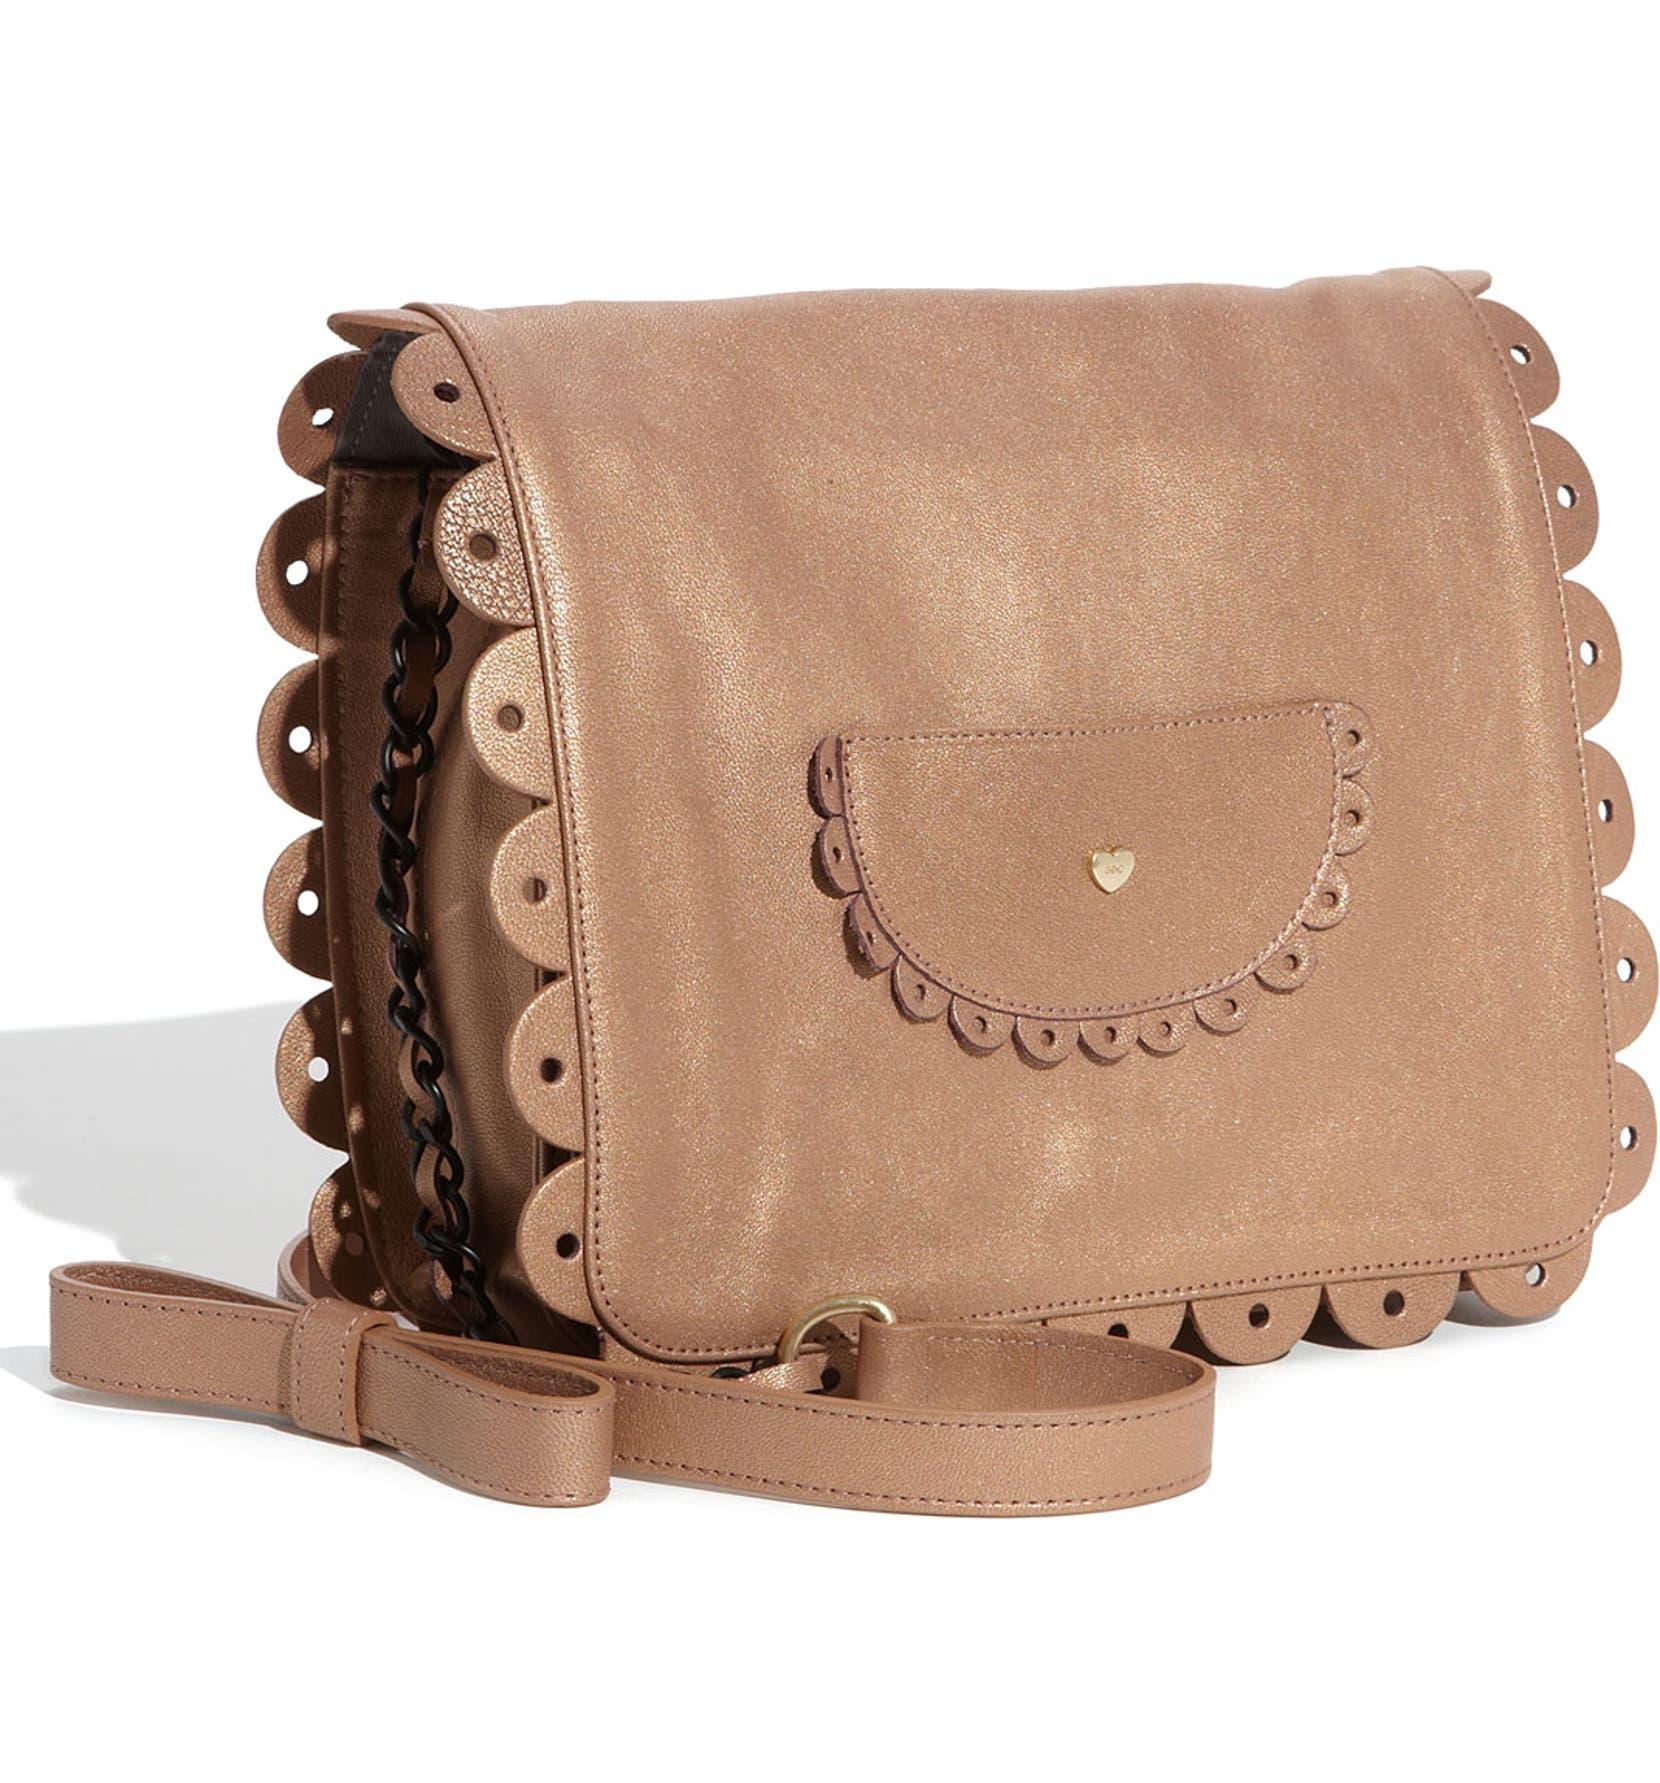 d57bc876f0956d Vintage Large Bag